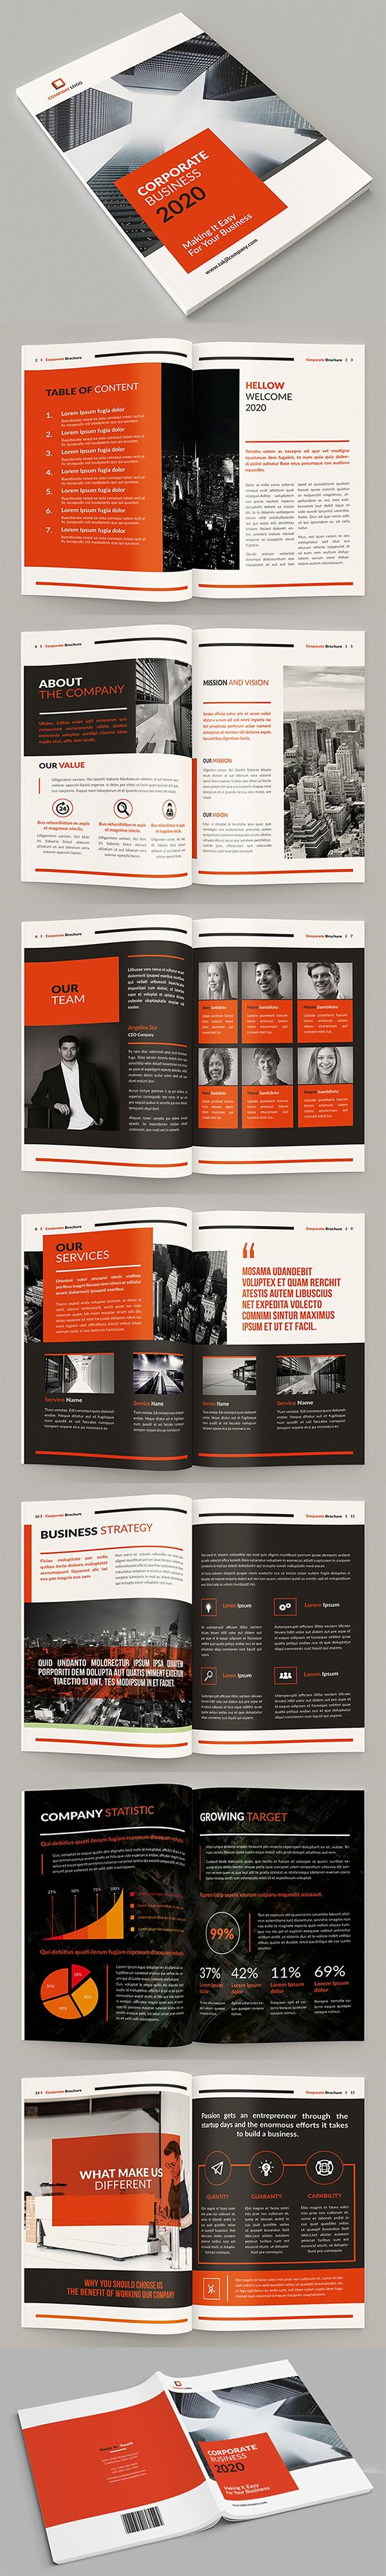 Samawa - A4 Business Brochure Template